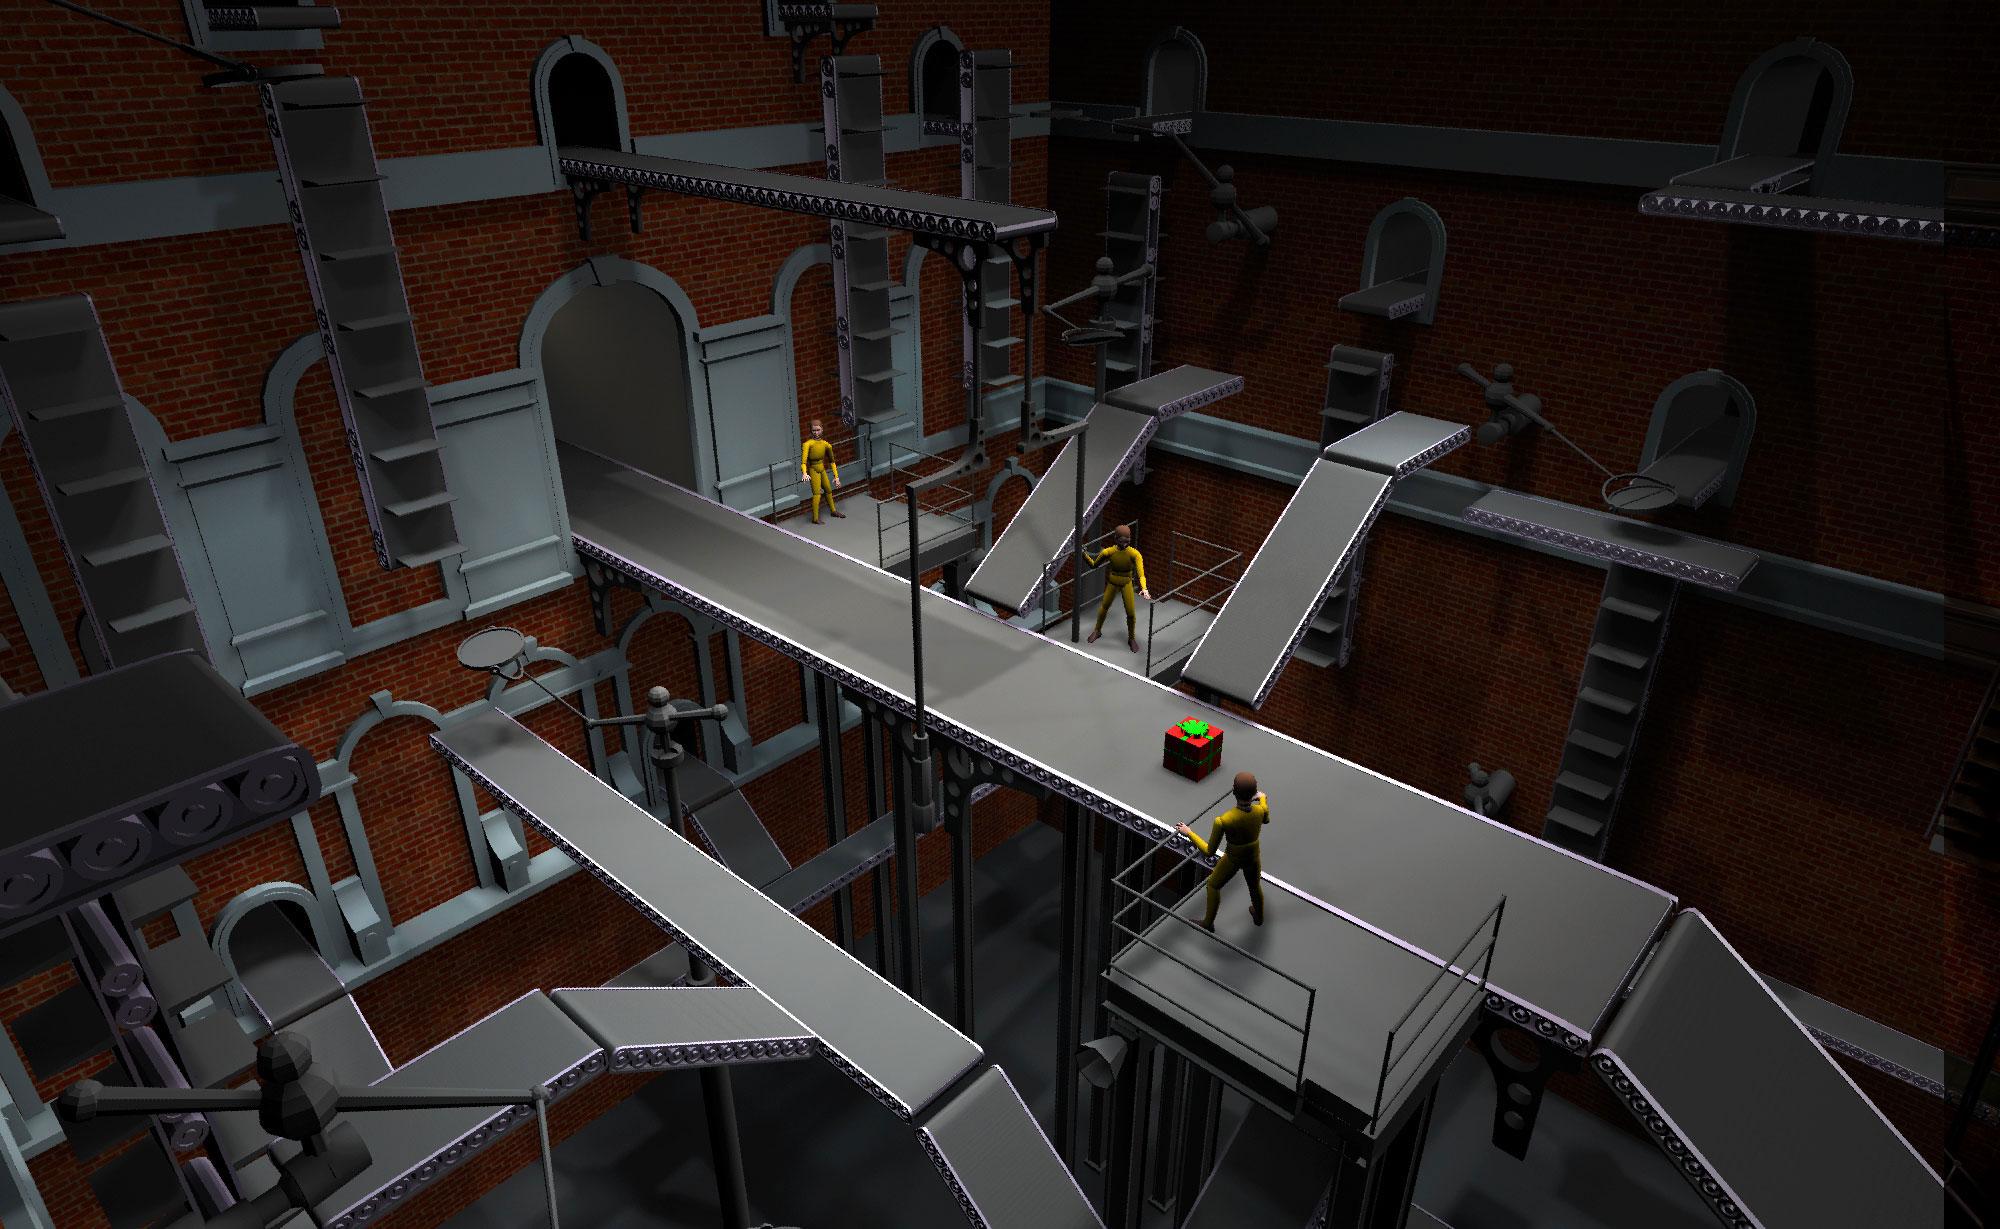 Artist Painting Conveyor Belt